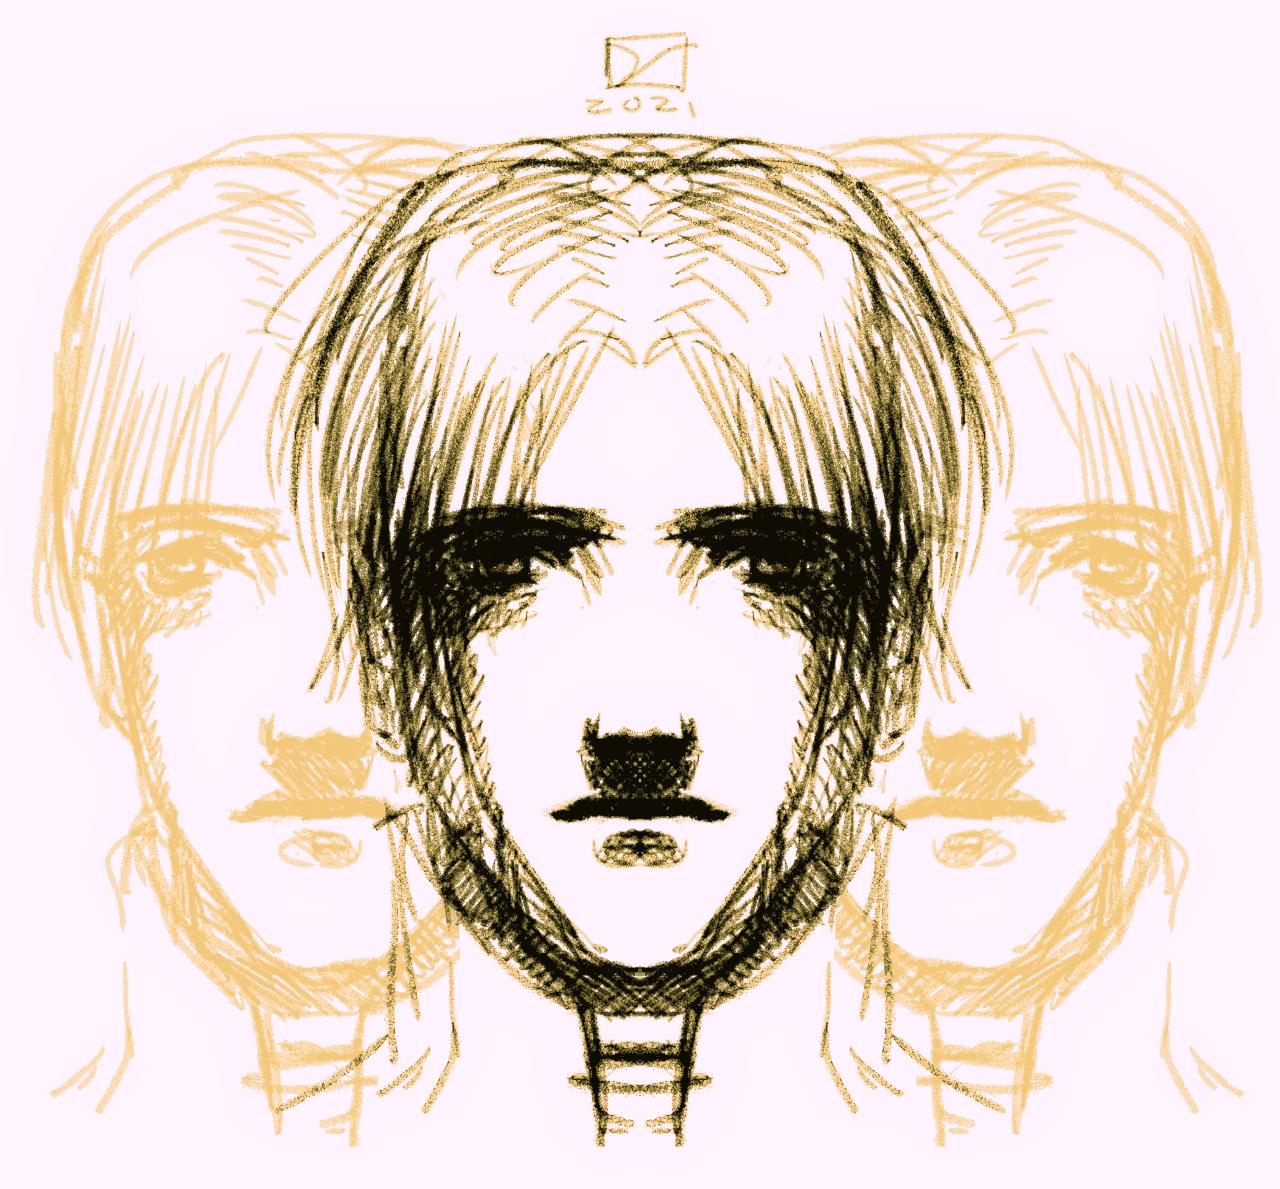 Quick Doodle 0x0B